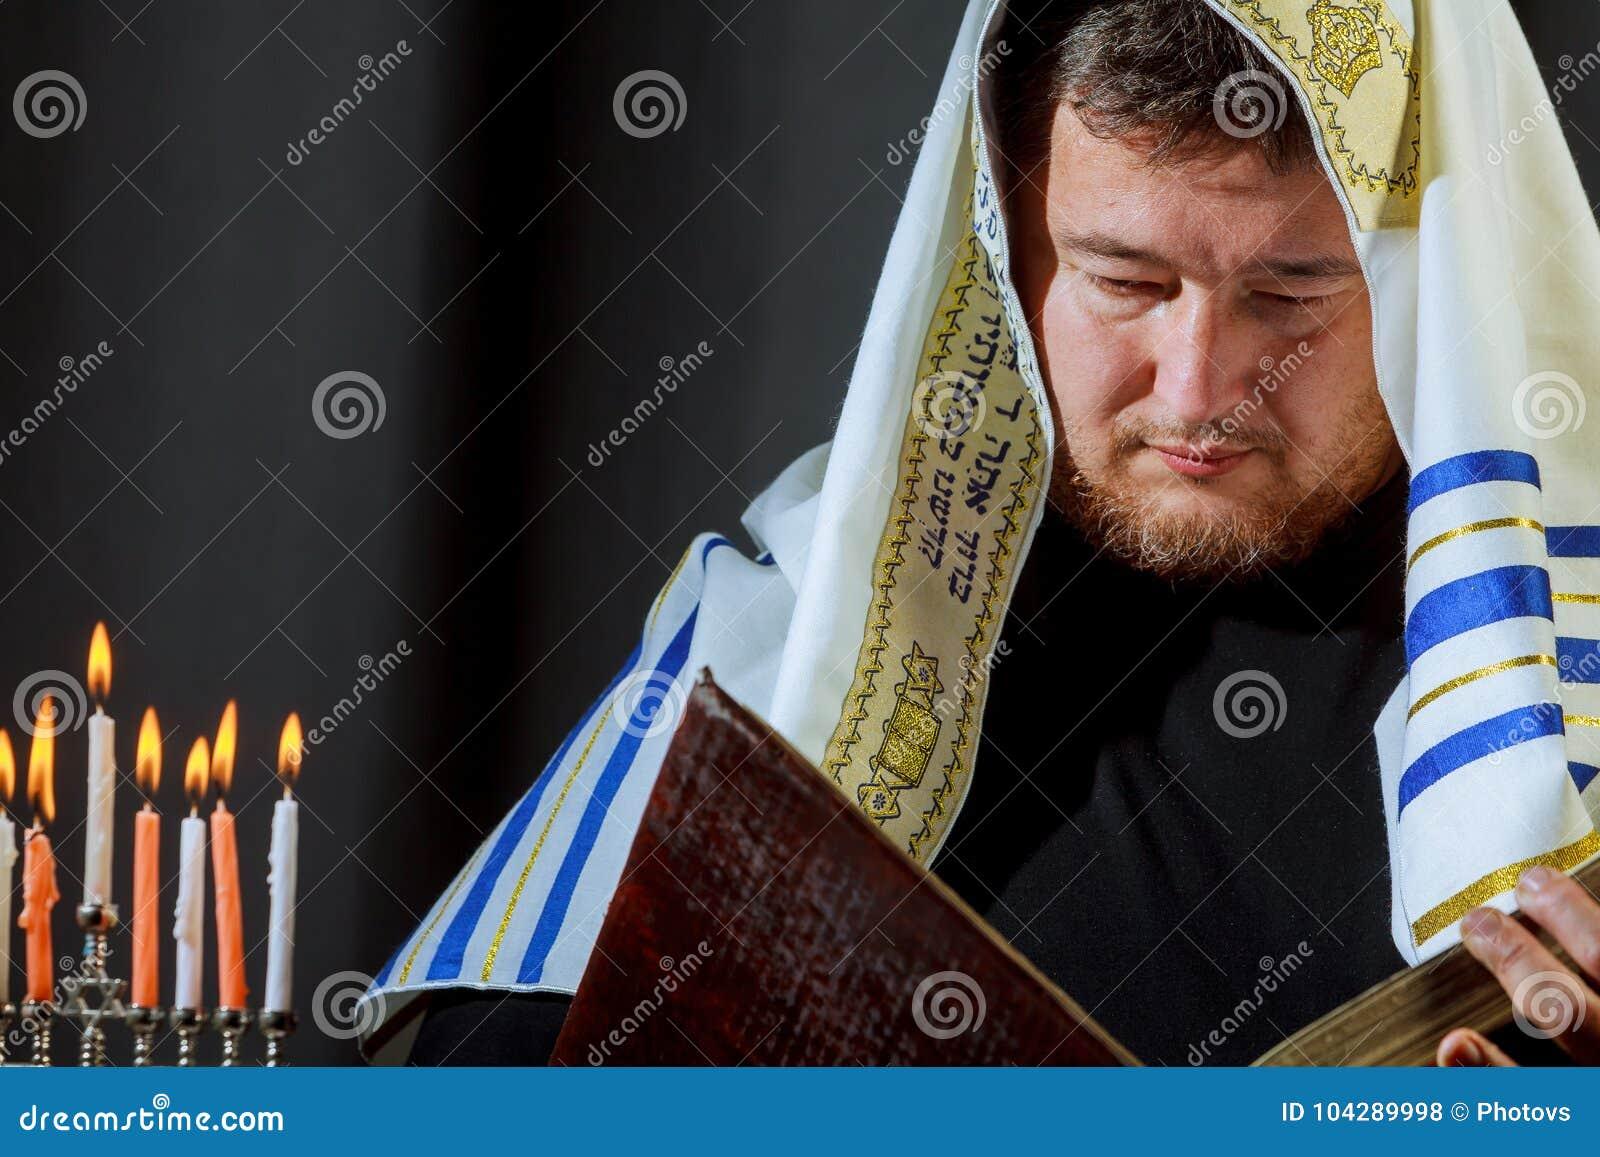 Male hand lighting candles in menorah on table Hanukkah